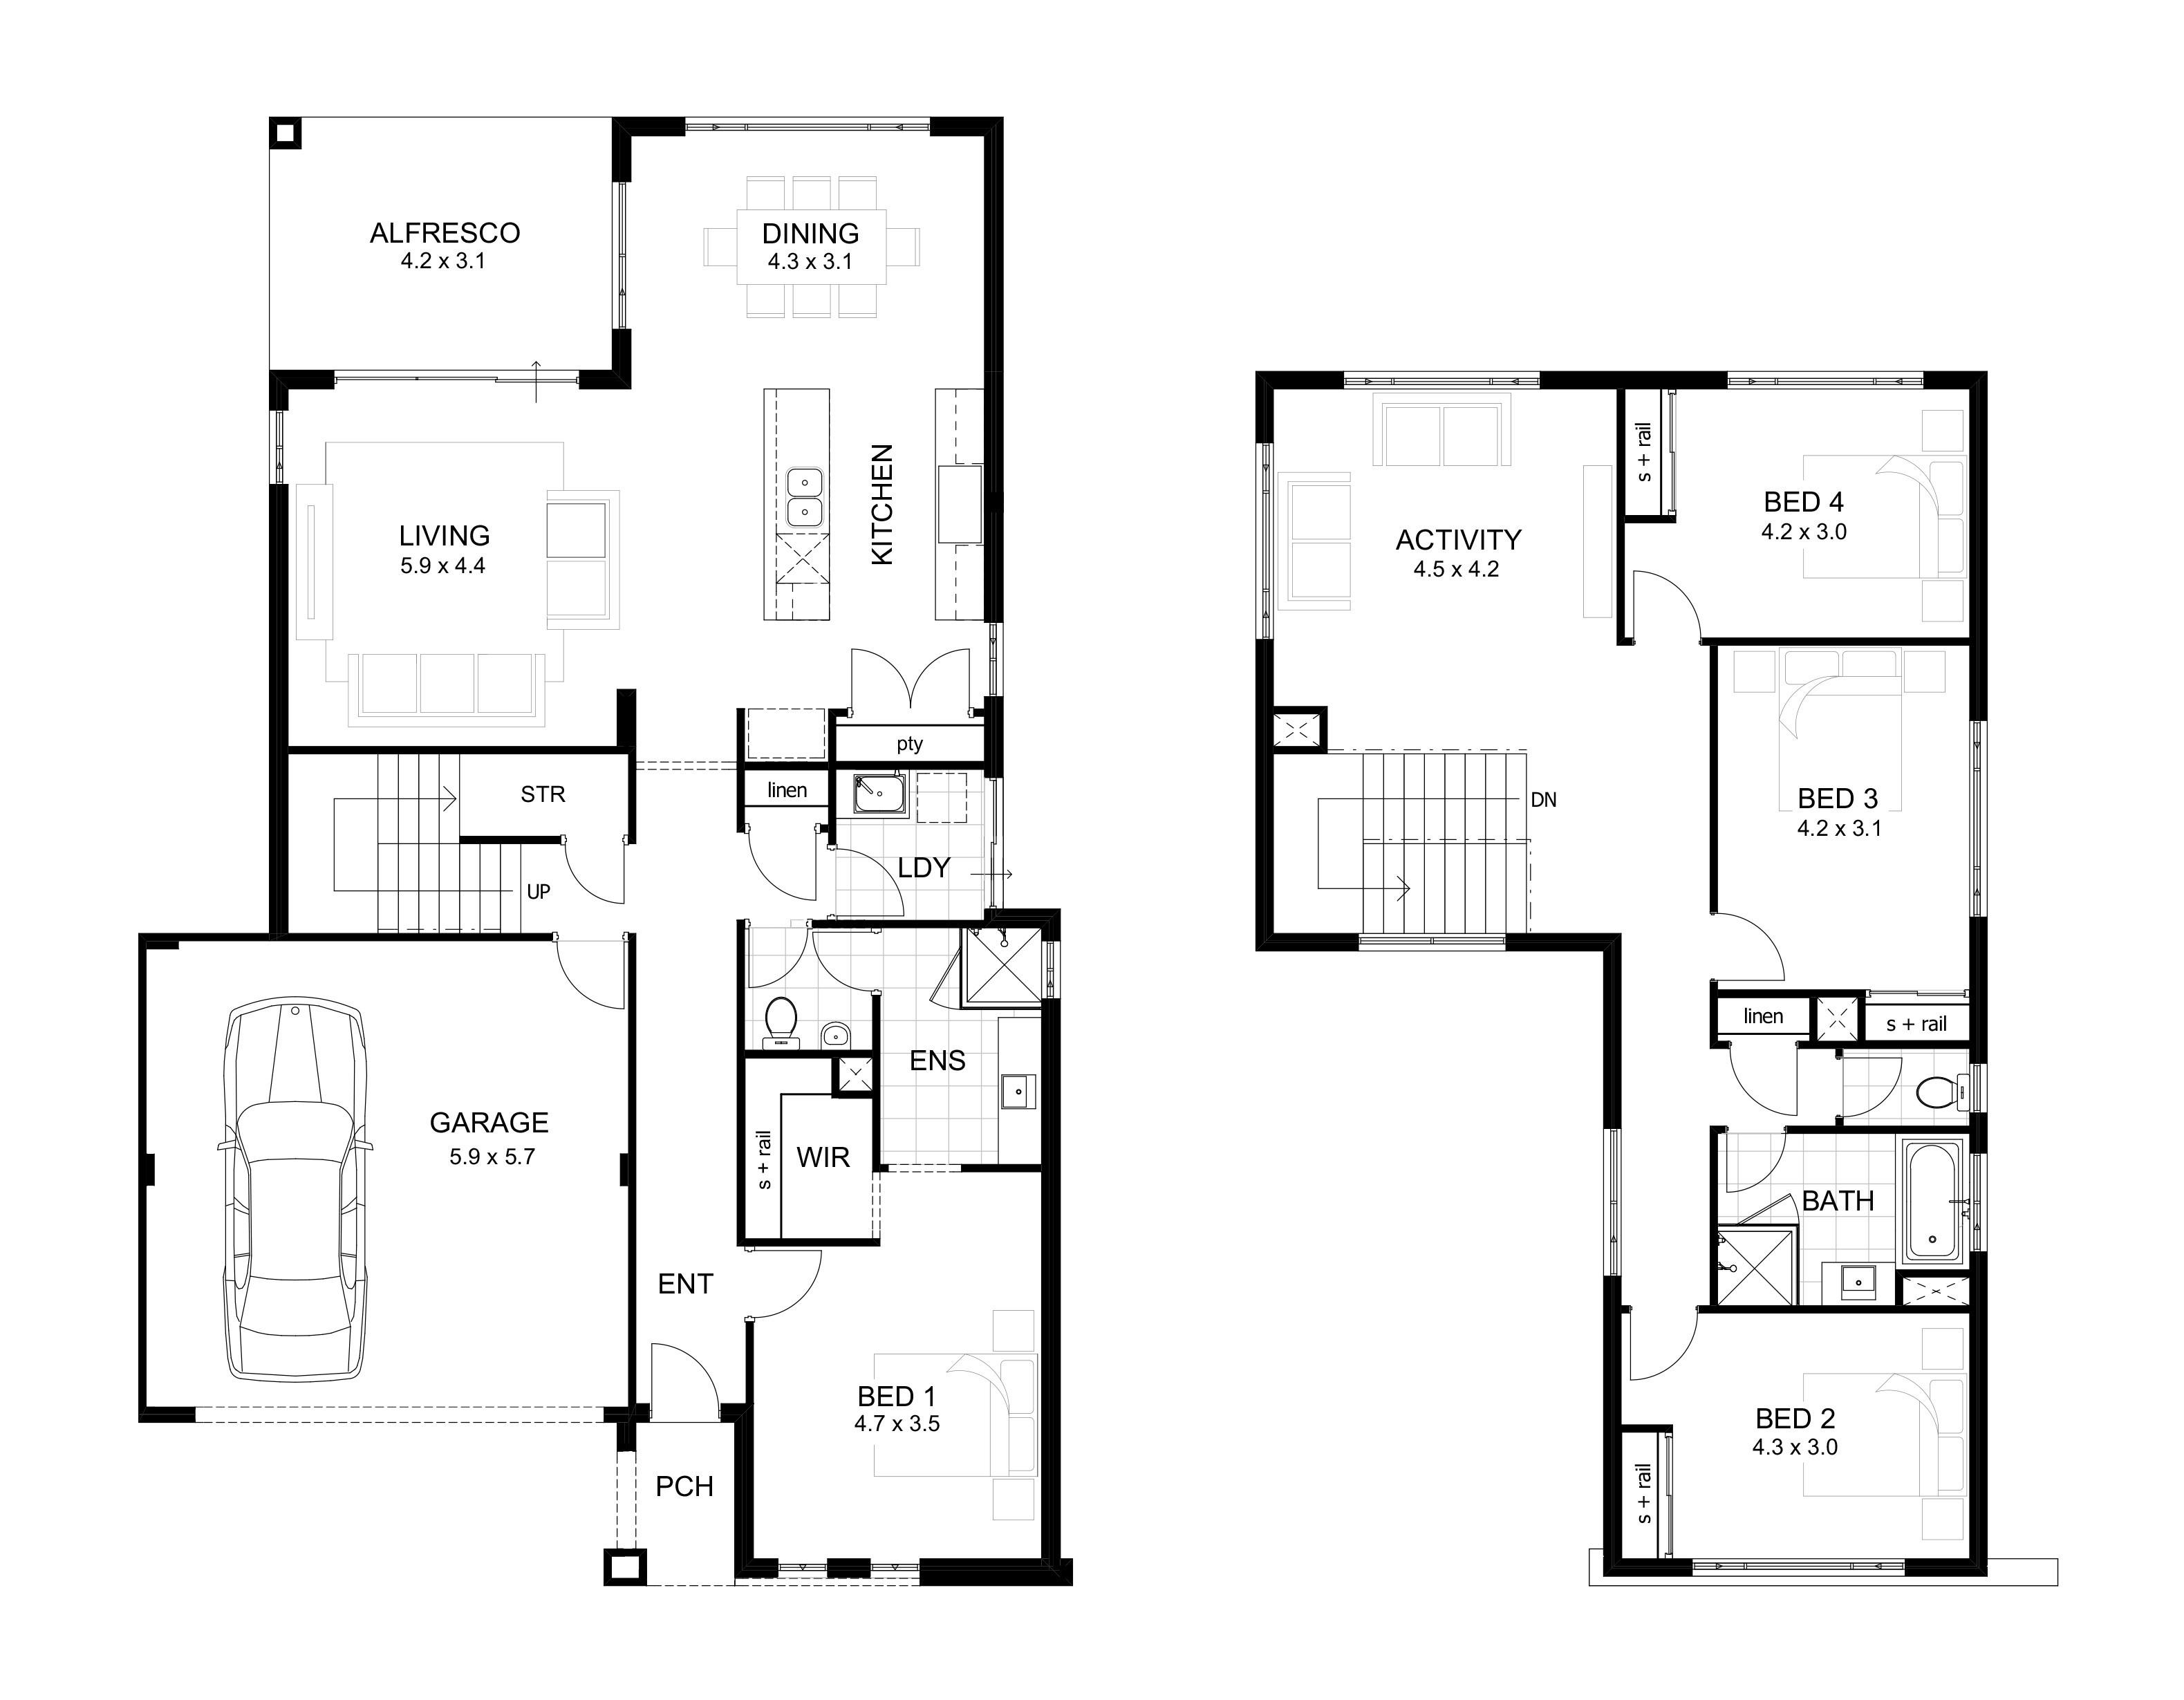 Dm 5078 Bedroom Electrical Wiring Diagram On Electrical Room Wiring Diagram Free Diagram